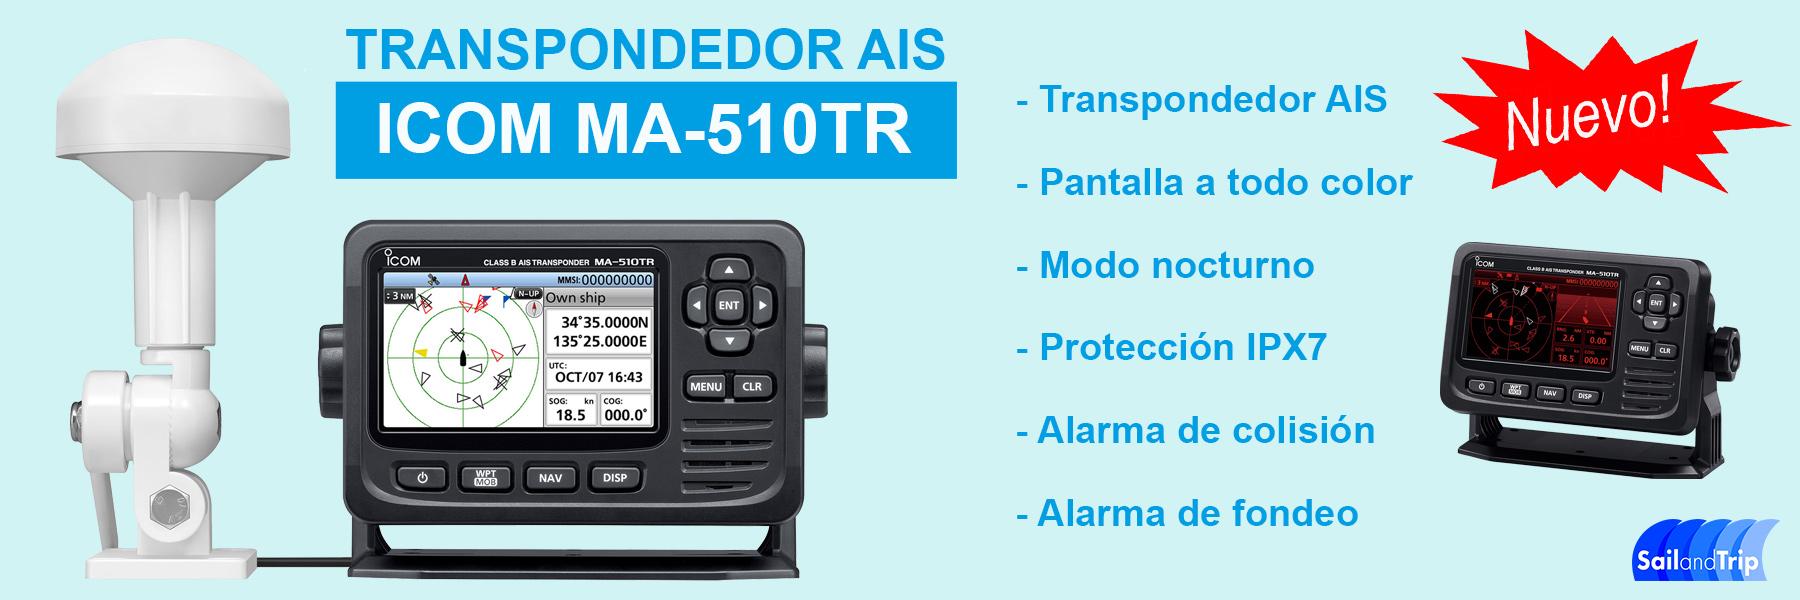 ICOM MA 510TR banner